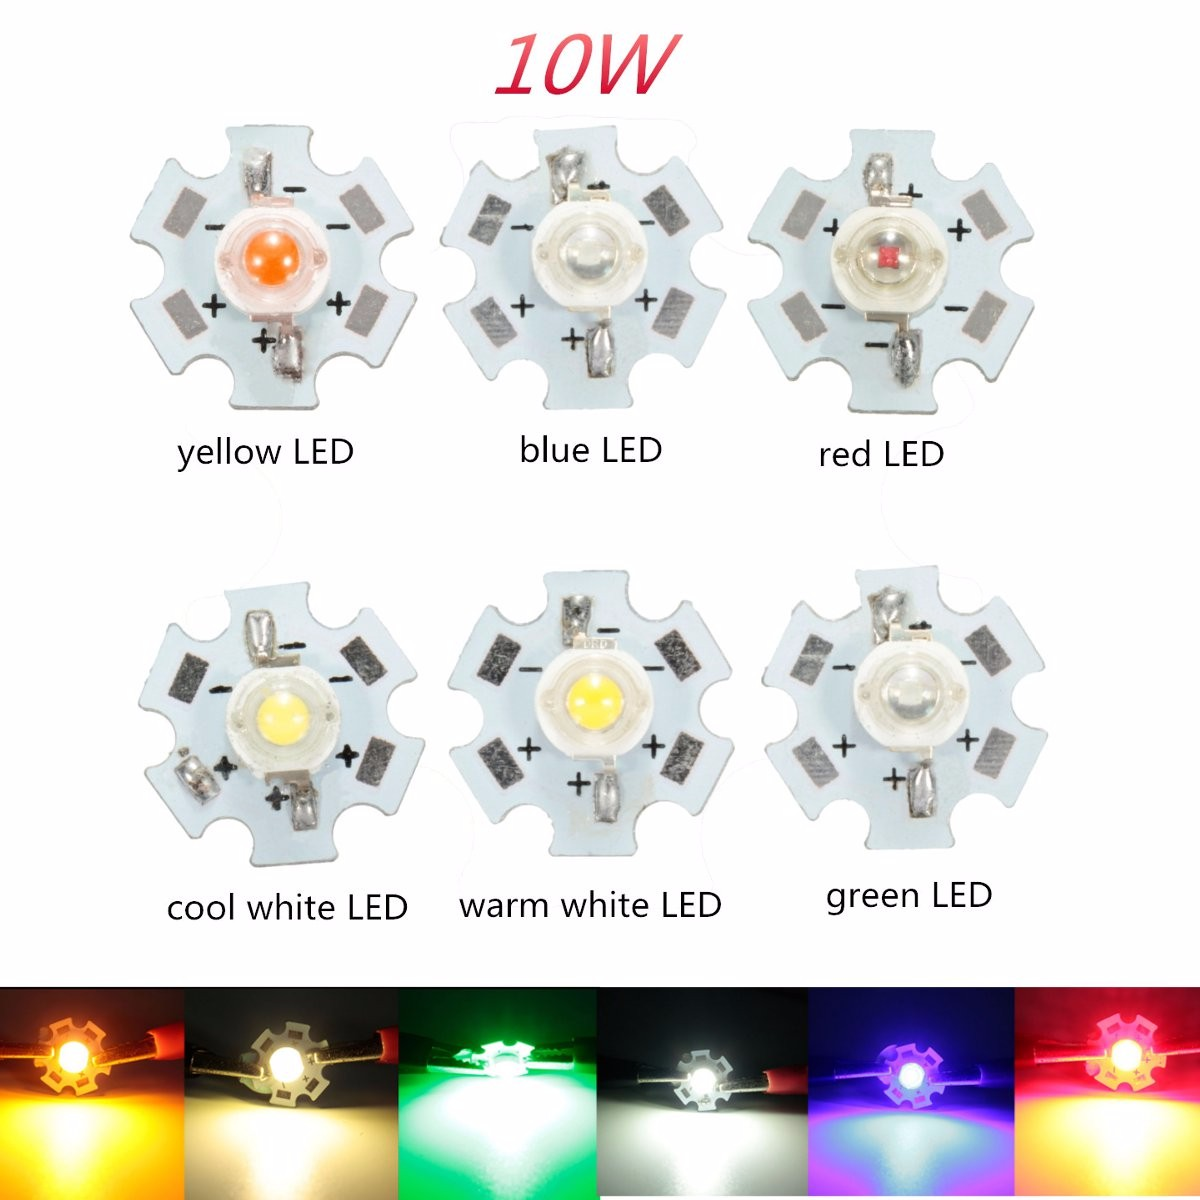 10 W High Power Led Pcb Lampe Licht Perlen Chips Auto Innen Lesen Lampe Aquarium Kühlkörper Neueste Technik